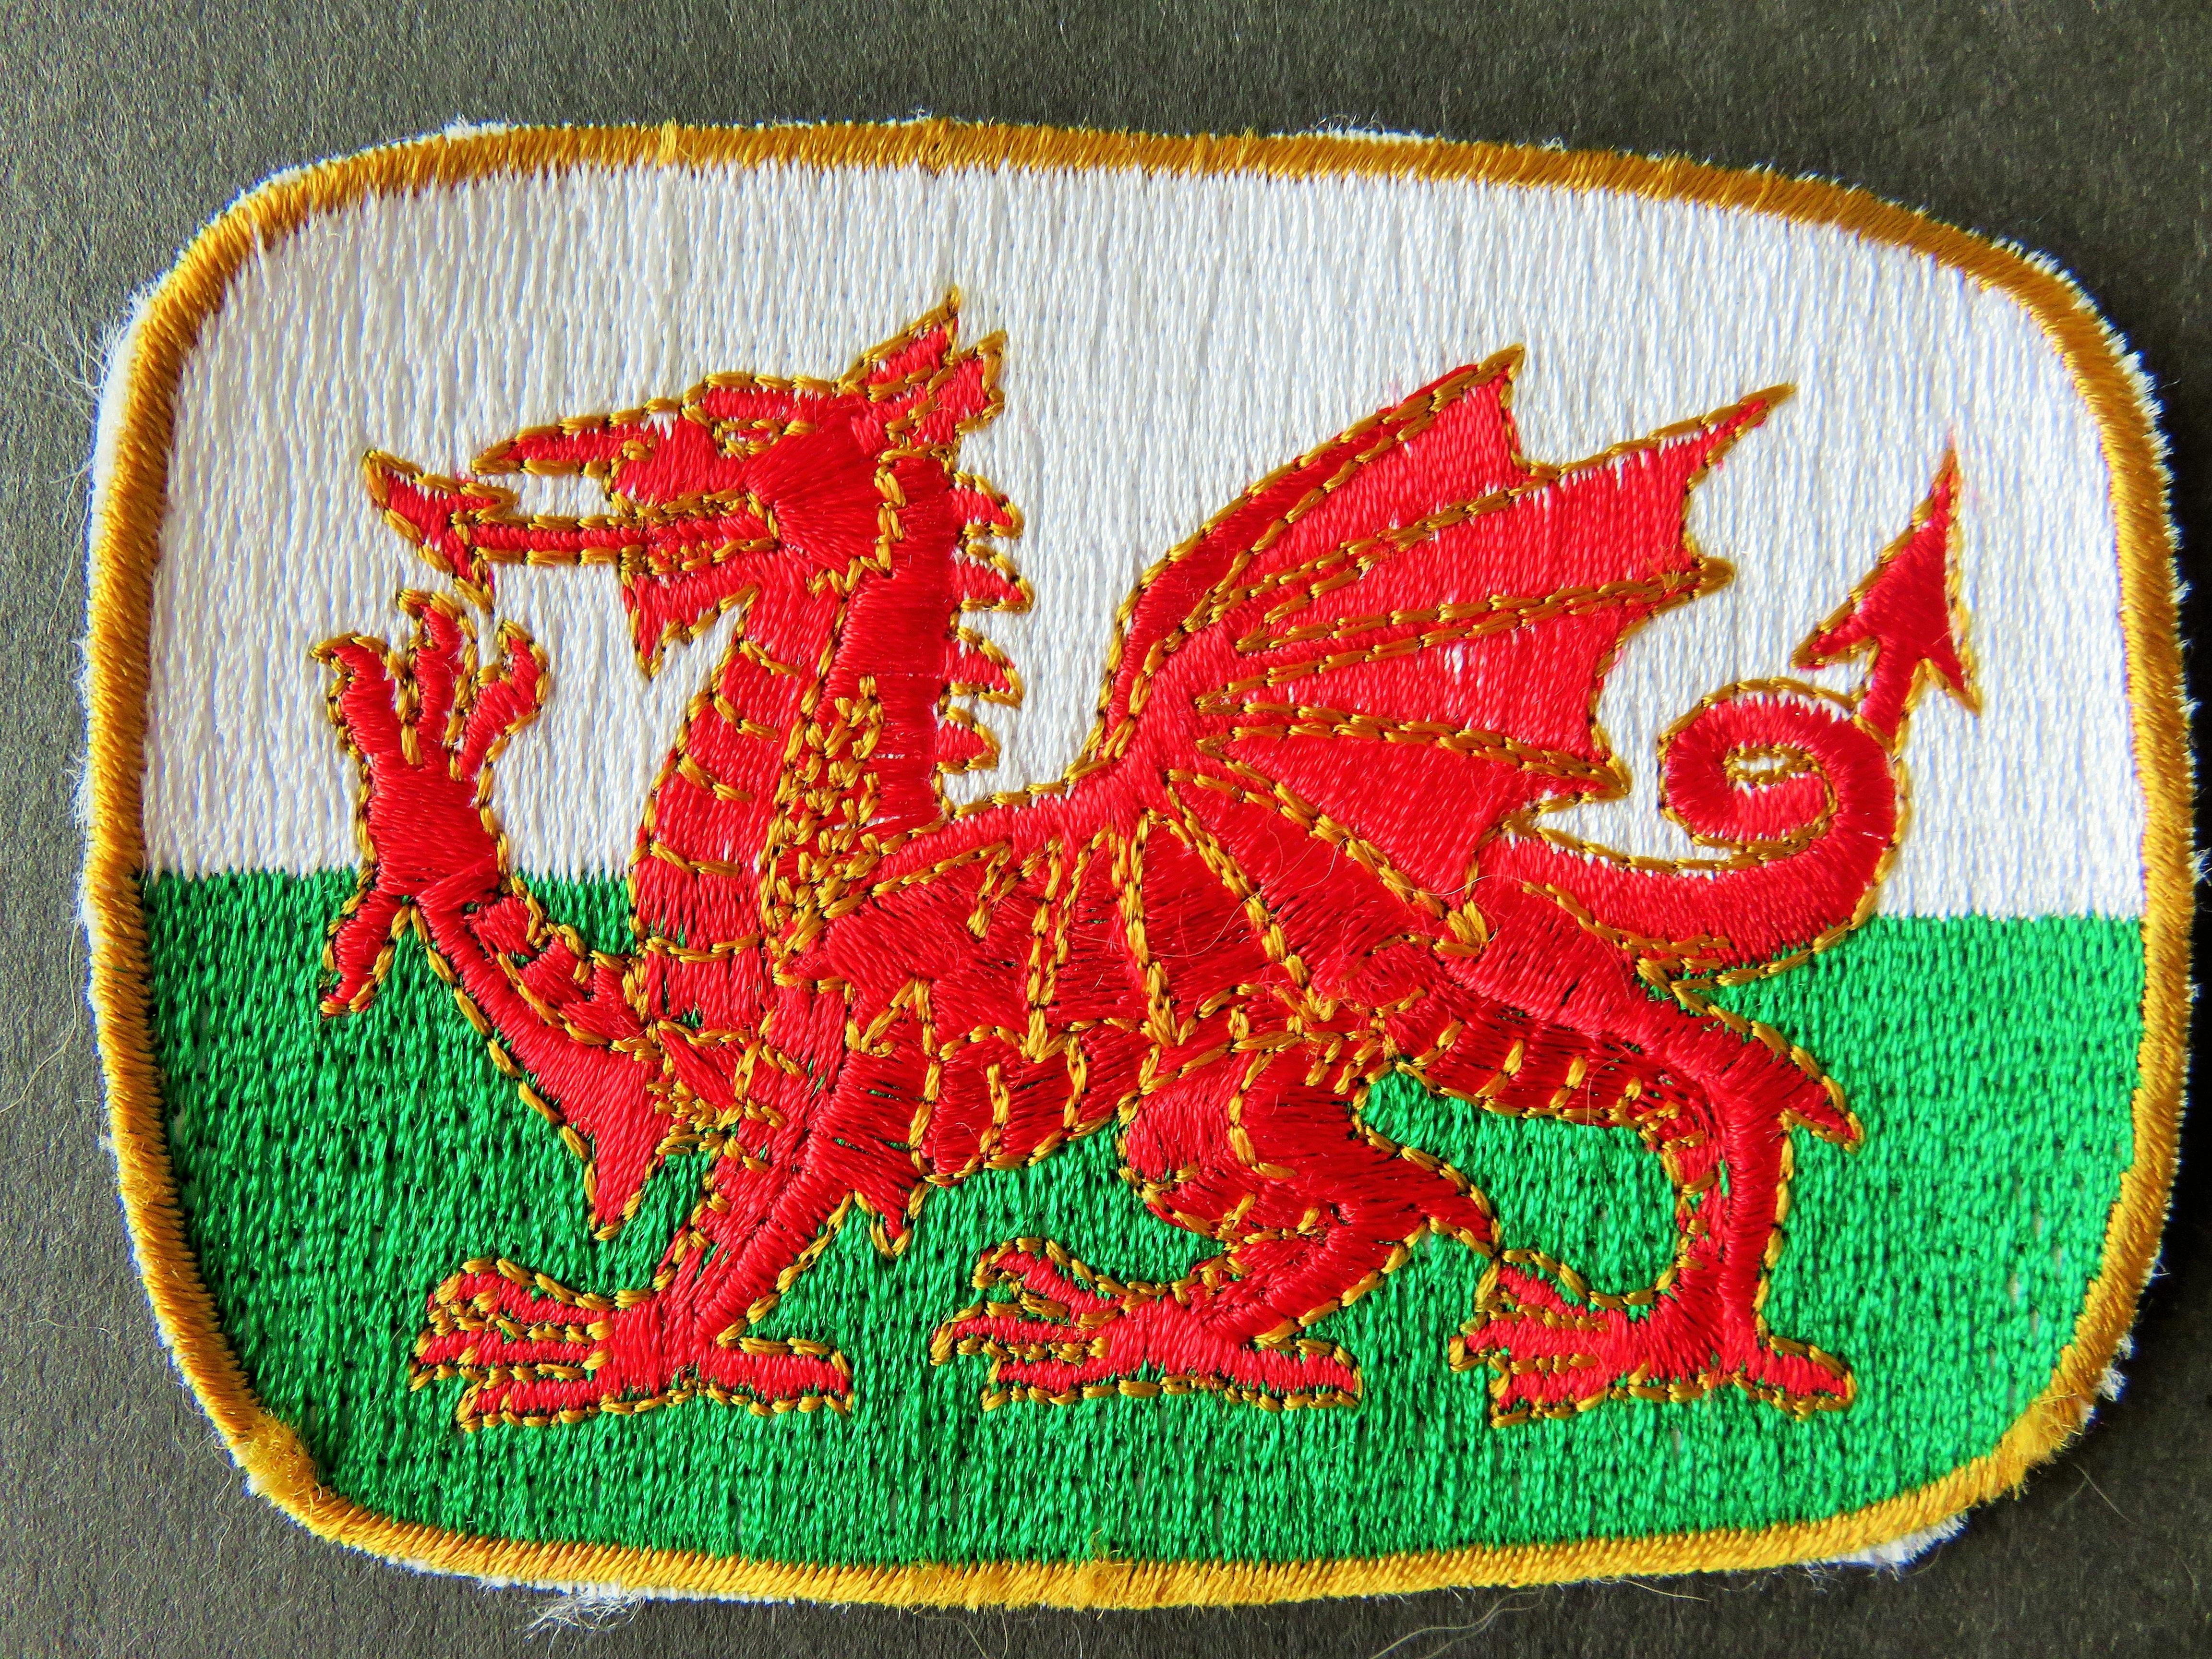 Fotos gratis : rojo, símbolo, bandera, emblema, cresta, nacional ...